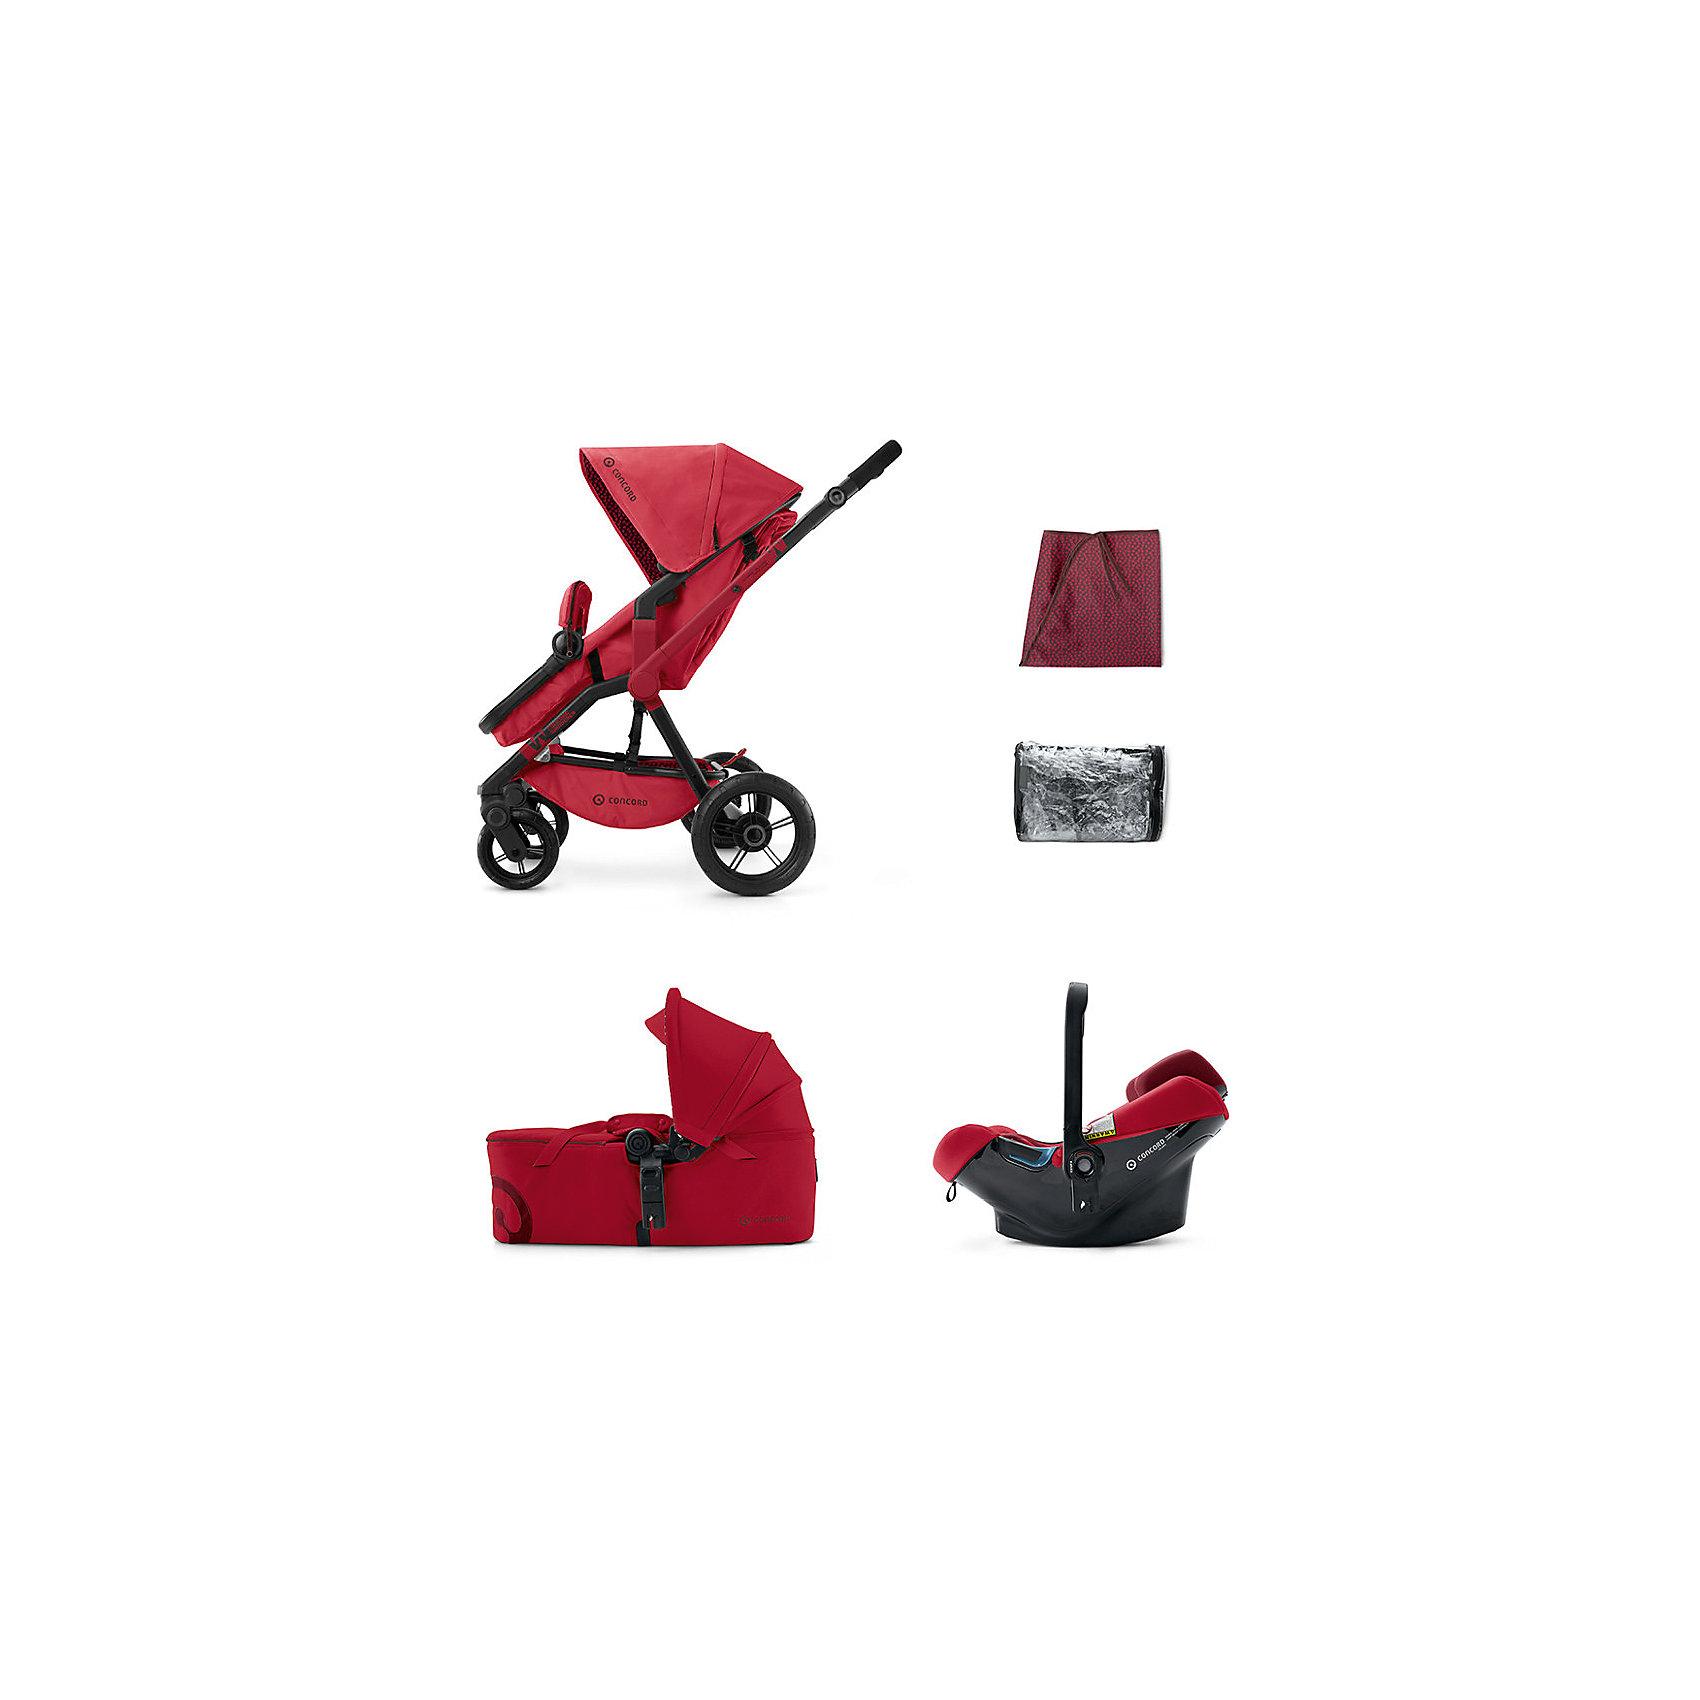 Коляска 3 в 1 Concord Wanderer Mobility Set, Ruby Red 2015